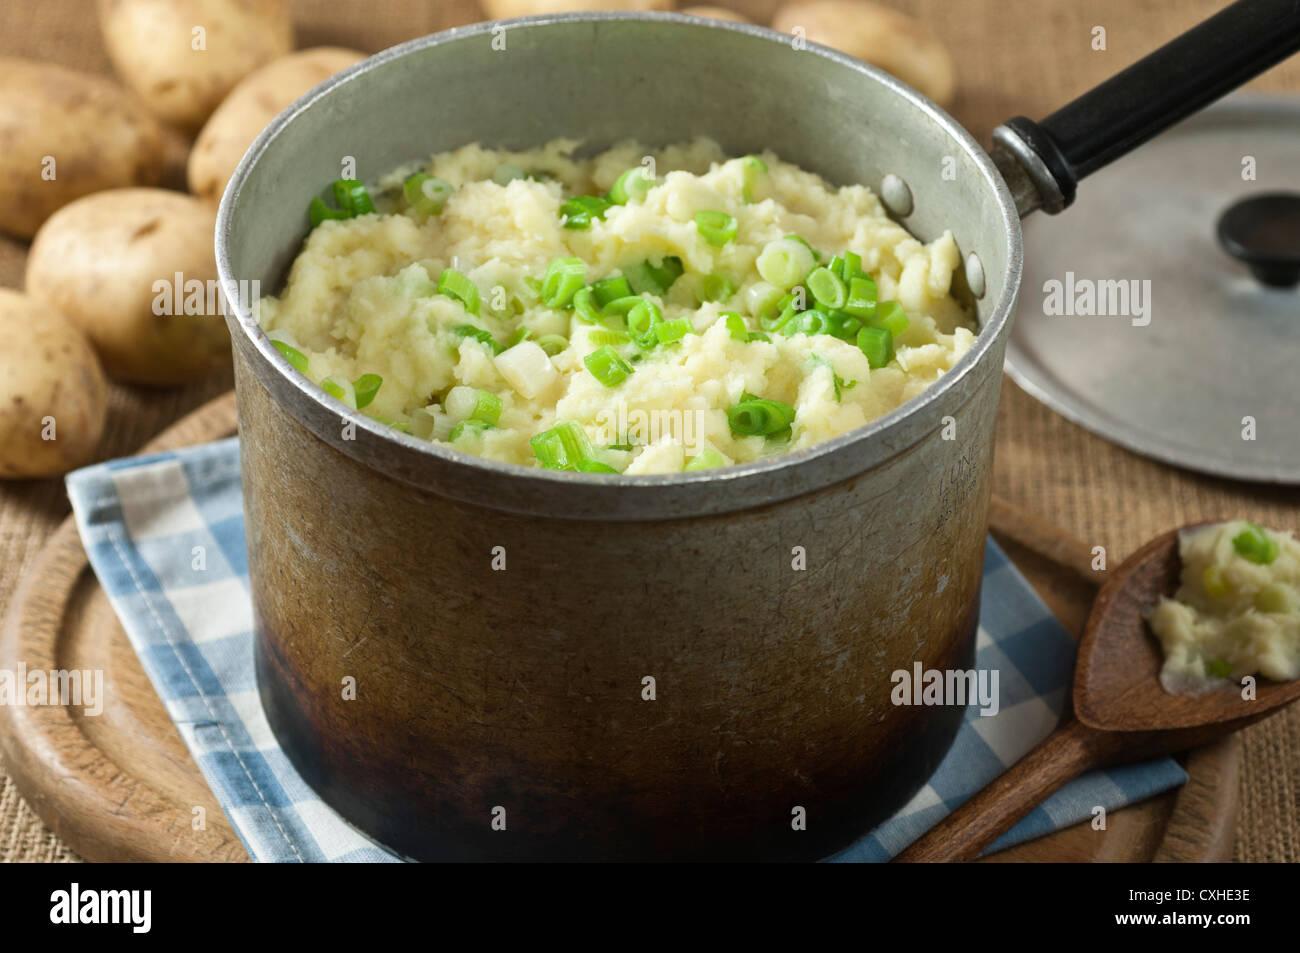 Champ potatoes Irish potato dish - Stock Image